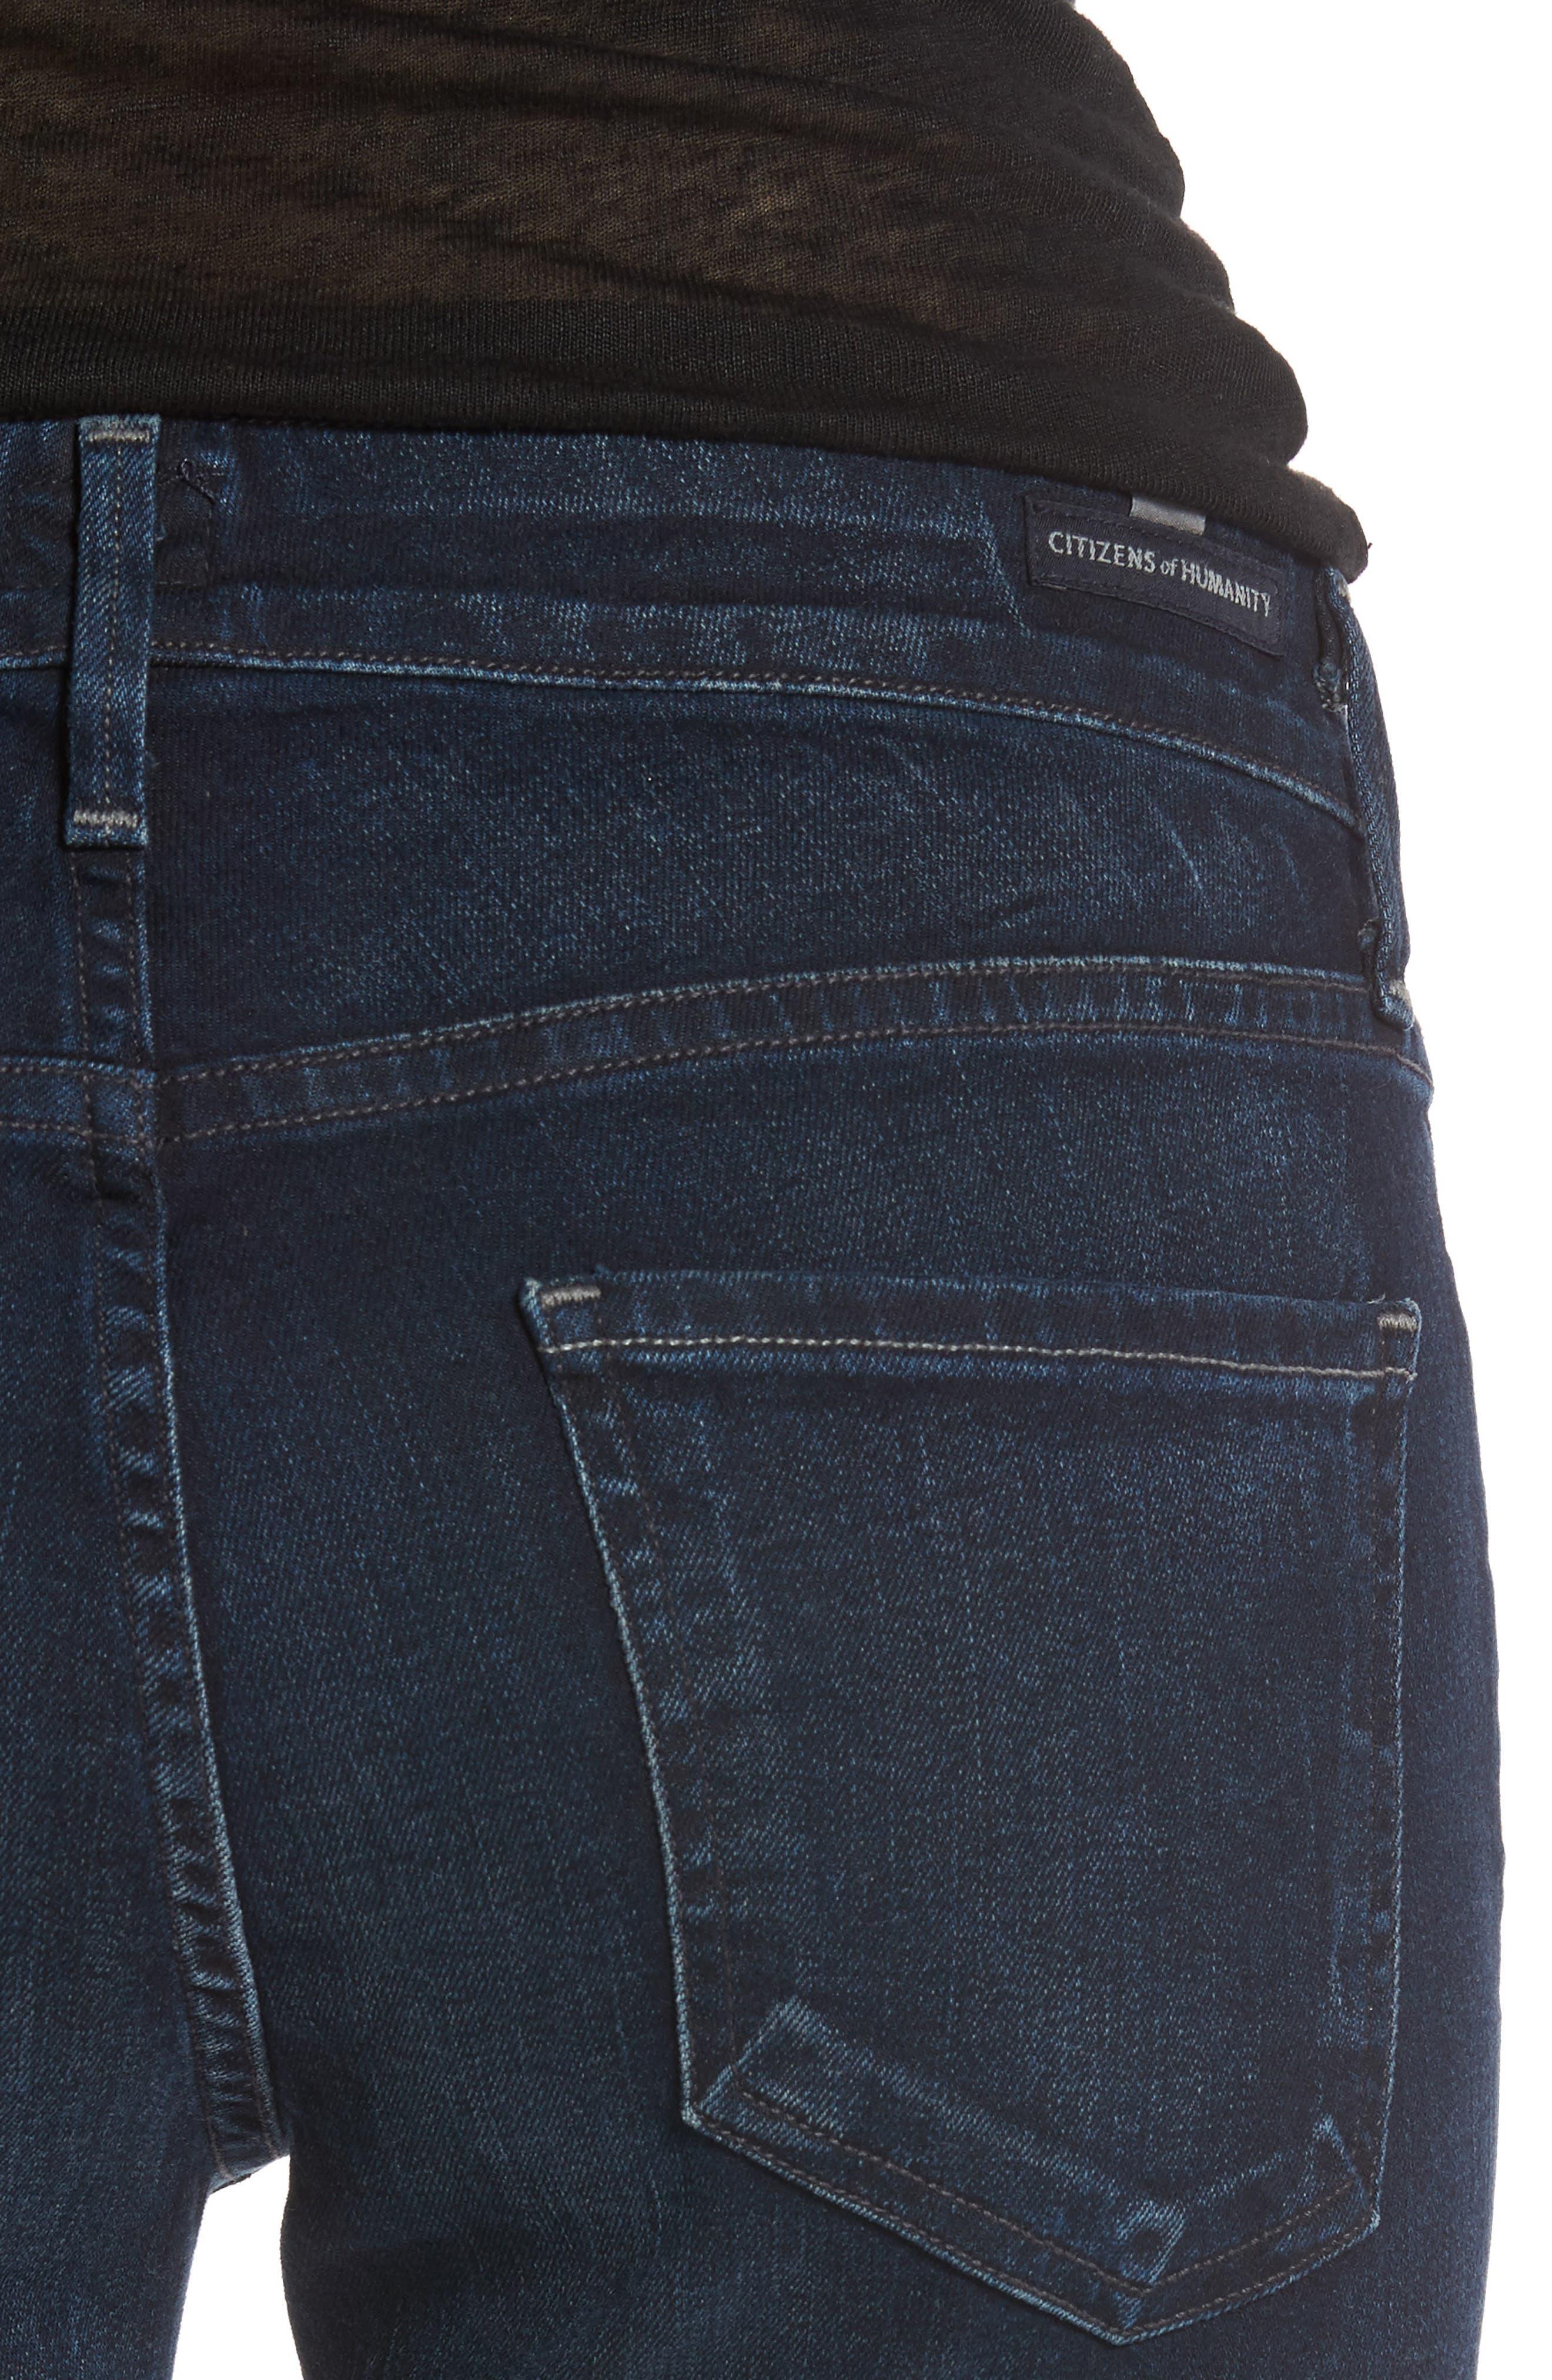 Arielle Skinny Jeans,                             Alternate thumbnail 4, color,                             406